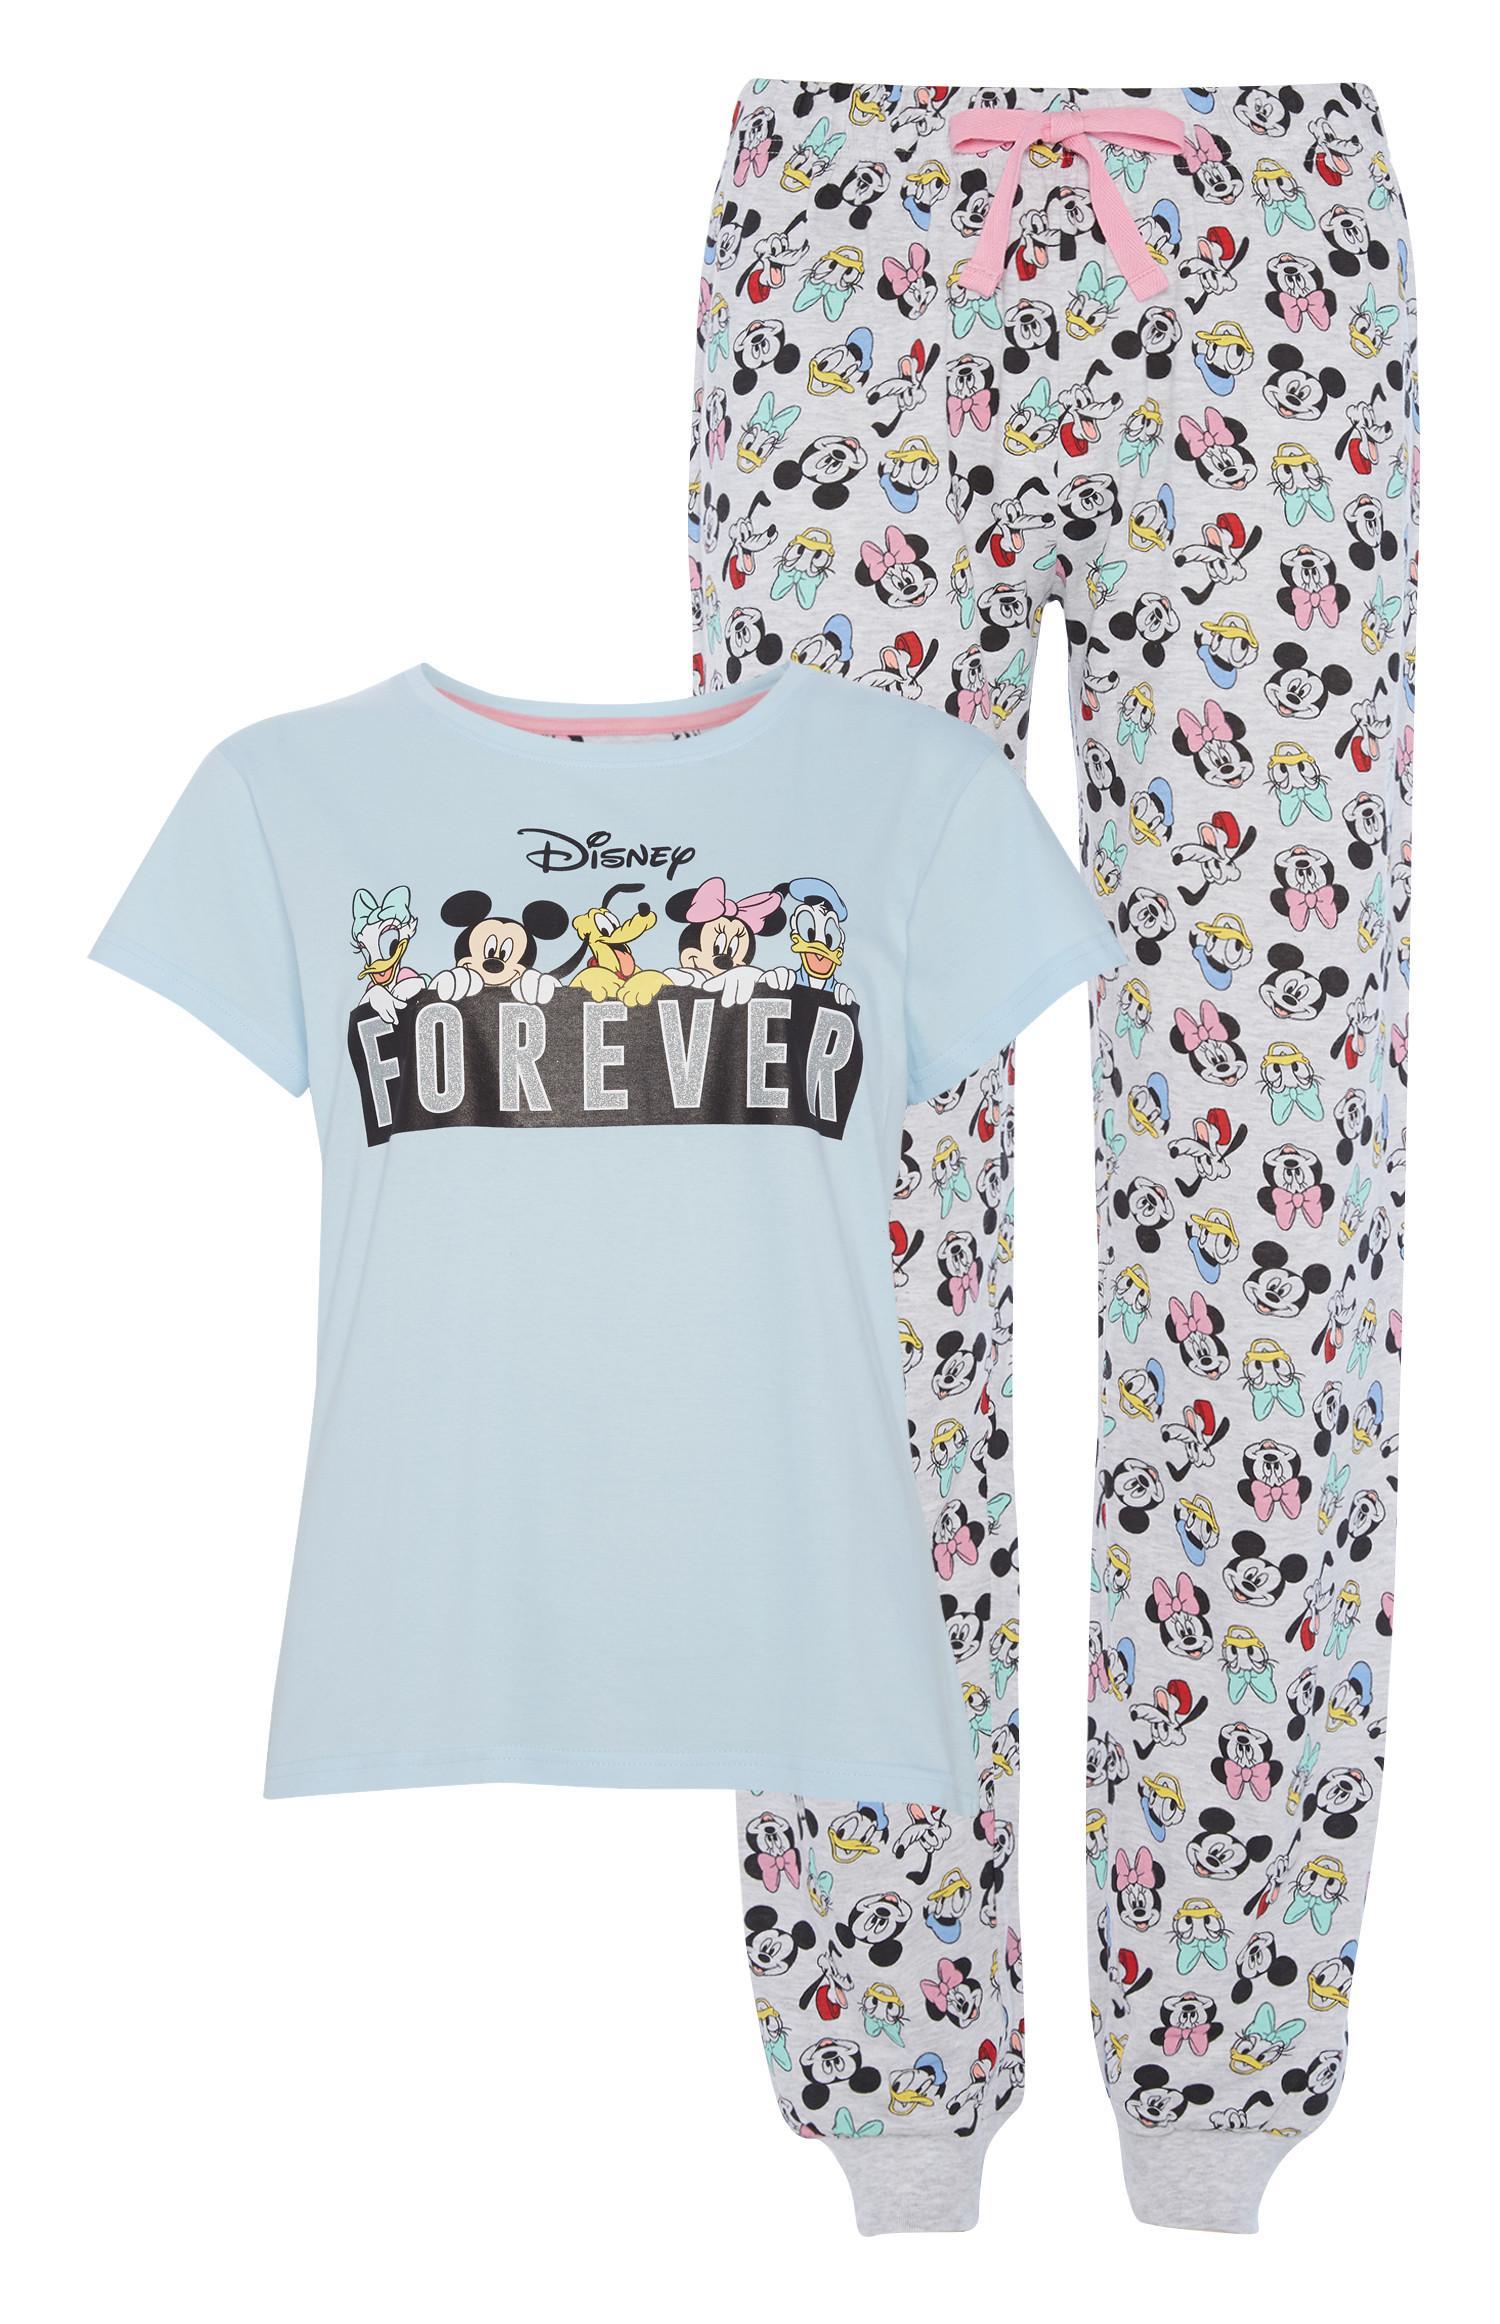 Disney Forever Pyjama Set